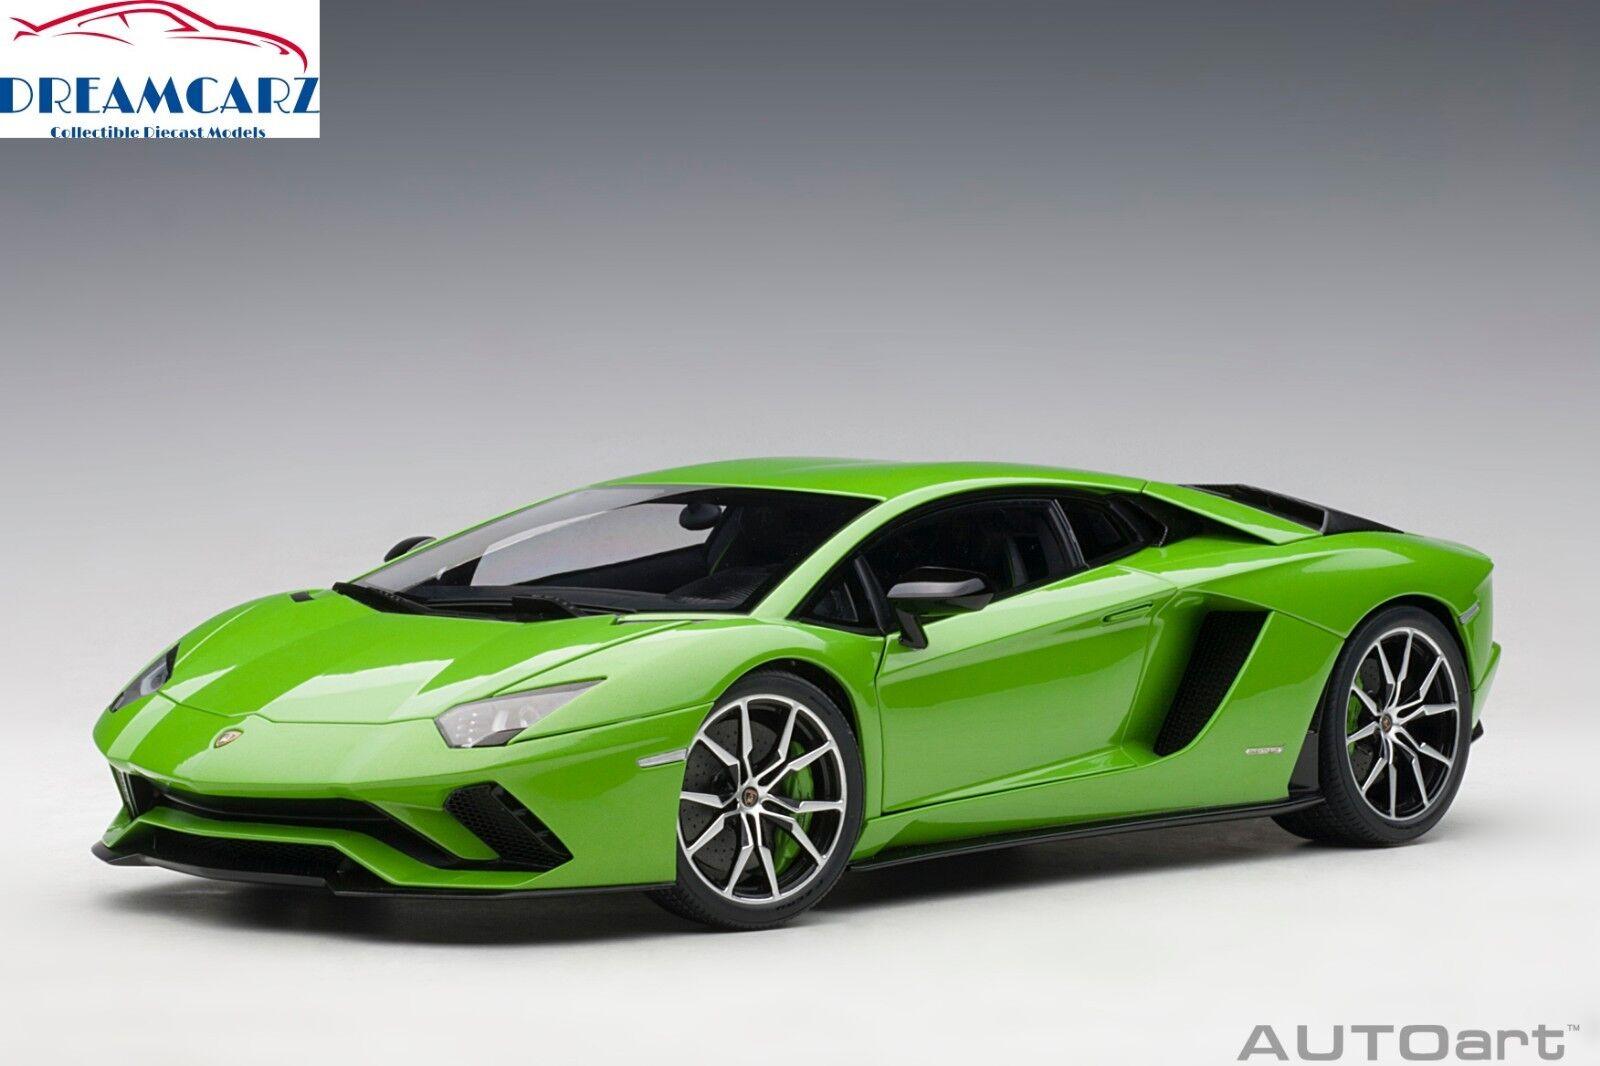 AUTOART 79133 1 18 LAMBORGHINI AVENTADOR S-vert Mantis (Pearl vert)